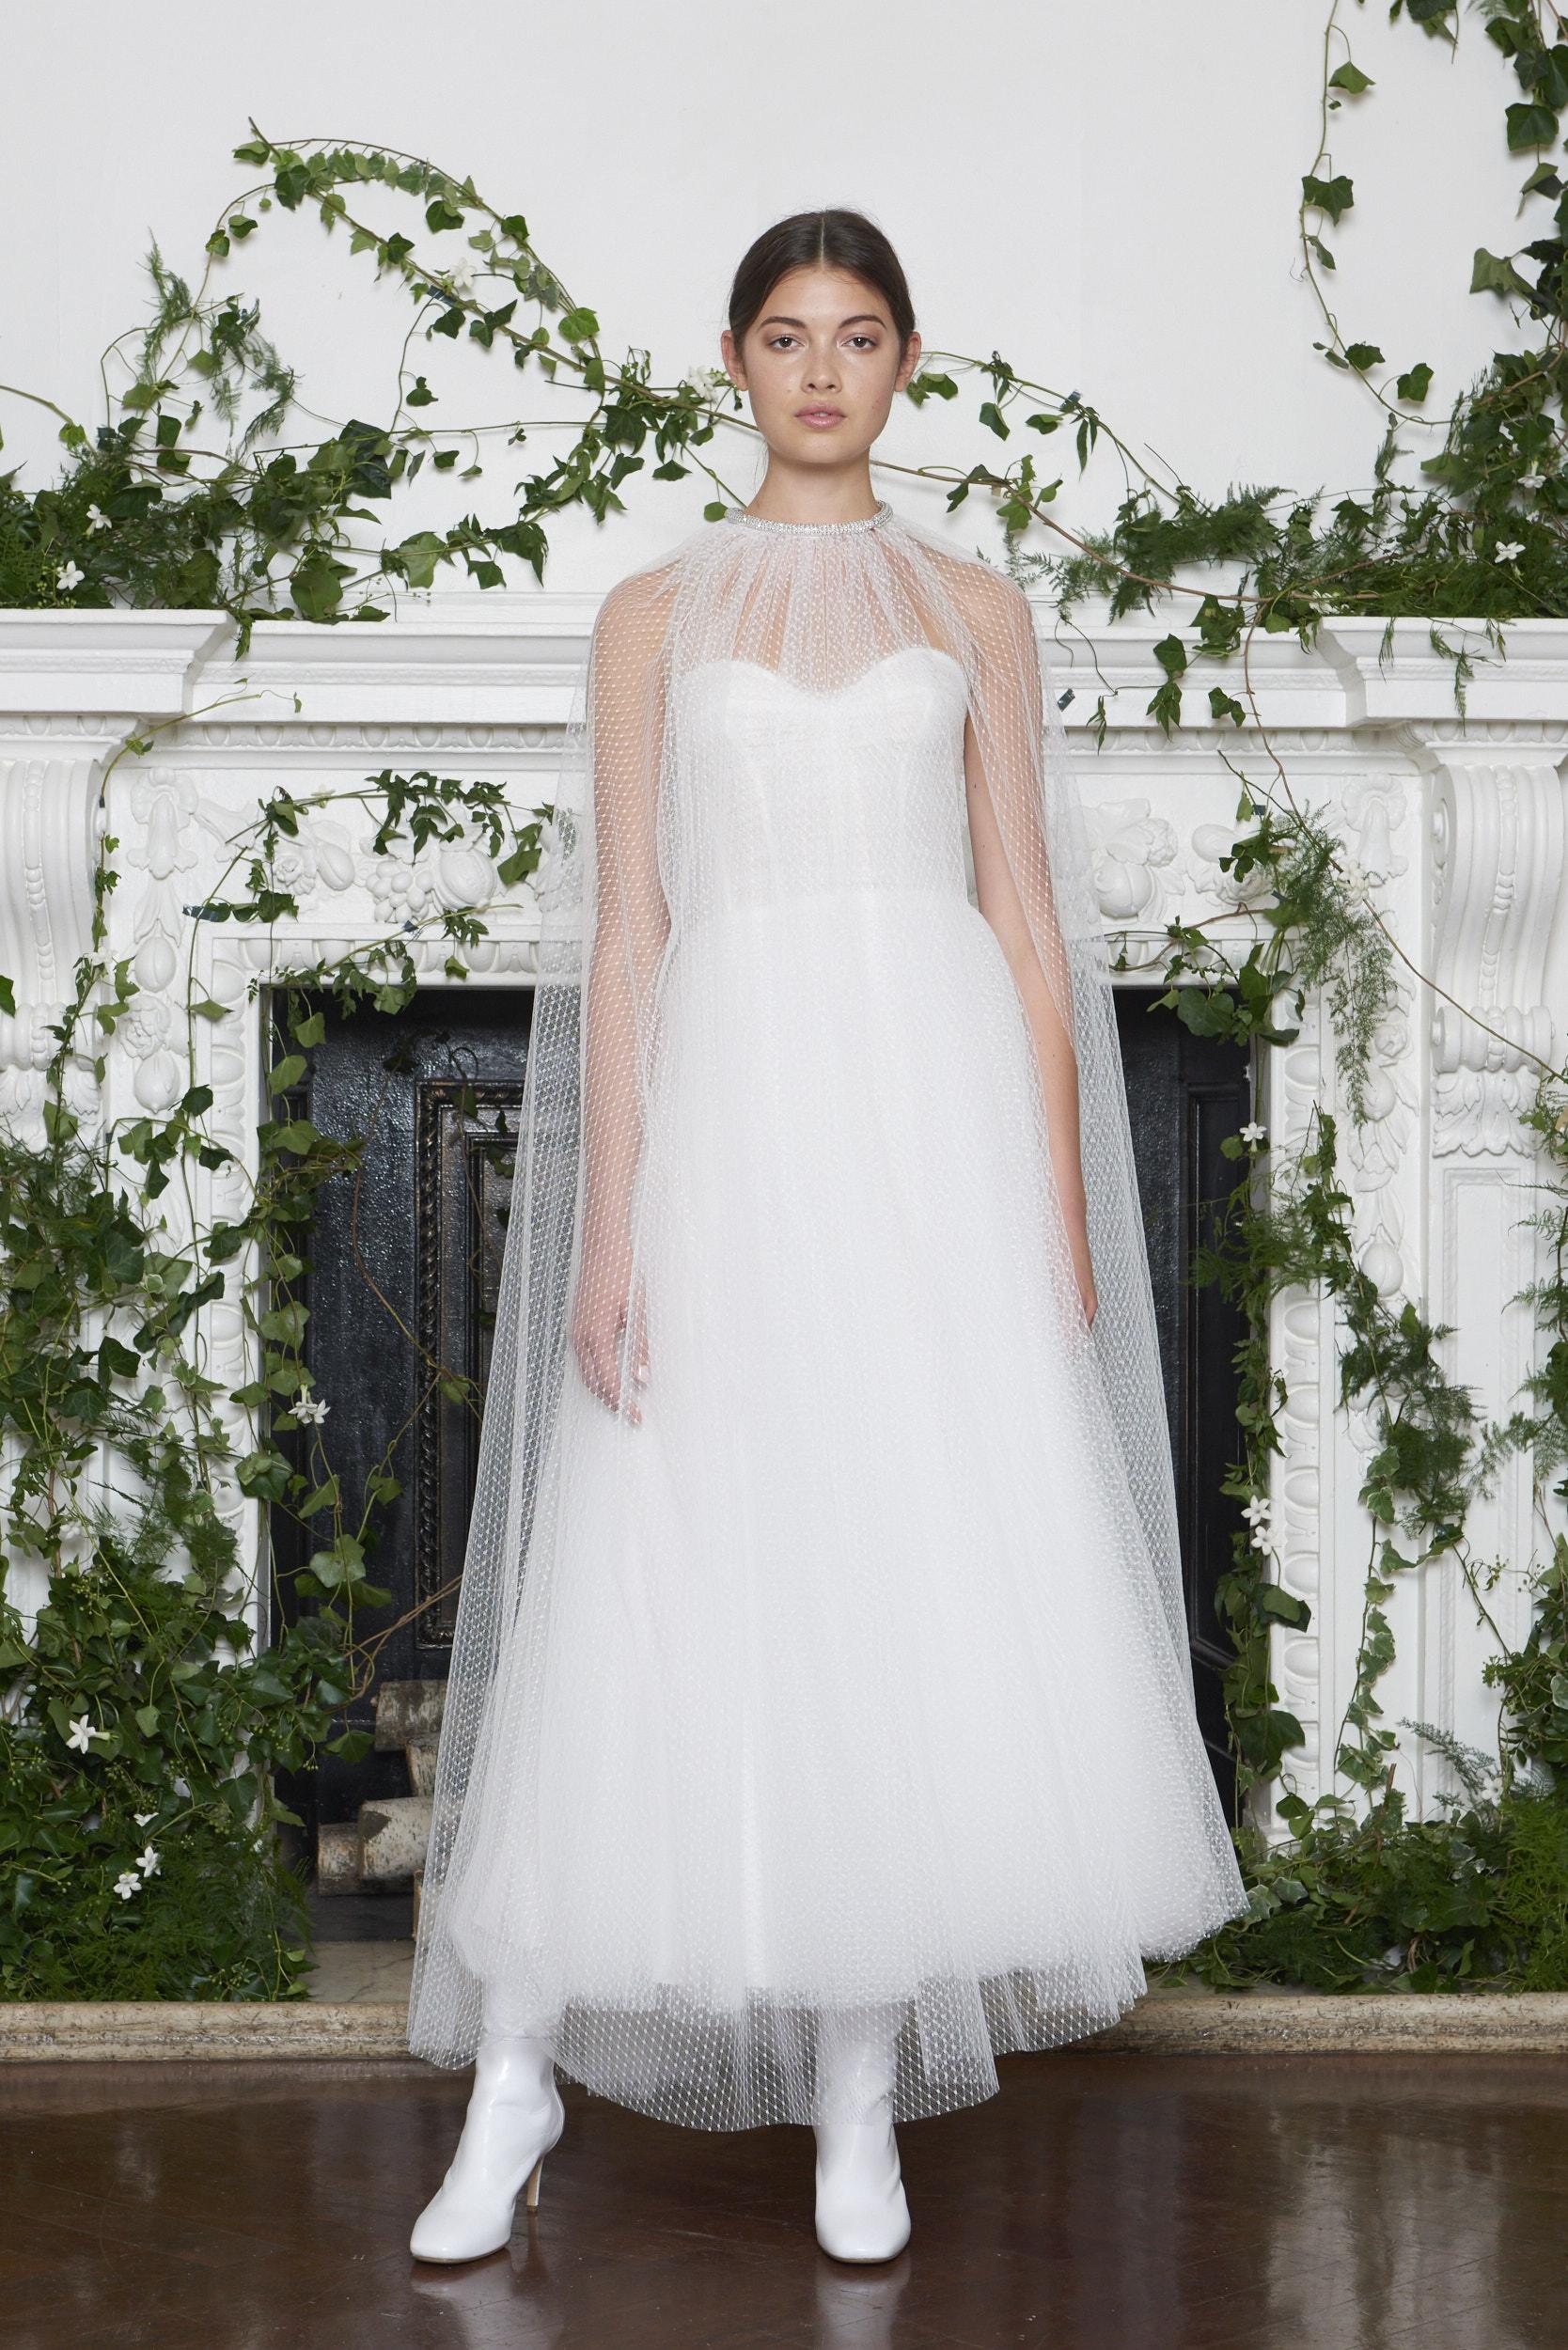 Monique Lhuillier Fall 2018 Tea-Length Tulle Wedding Dress